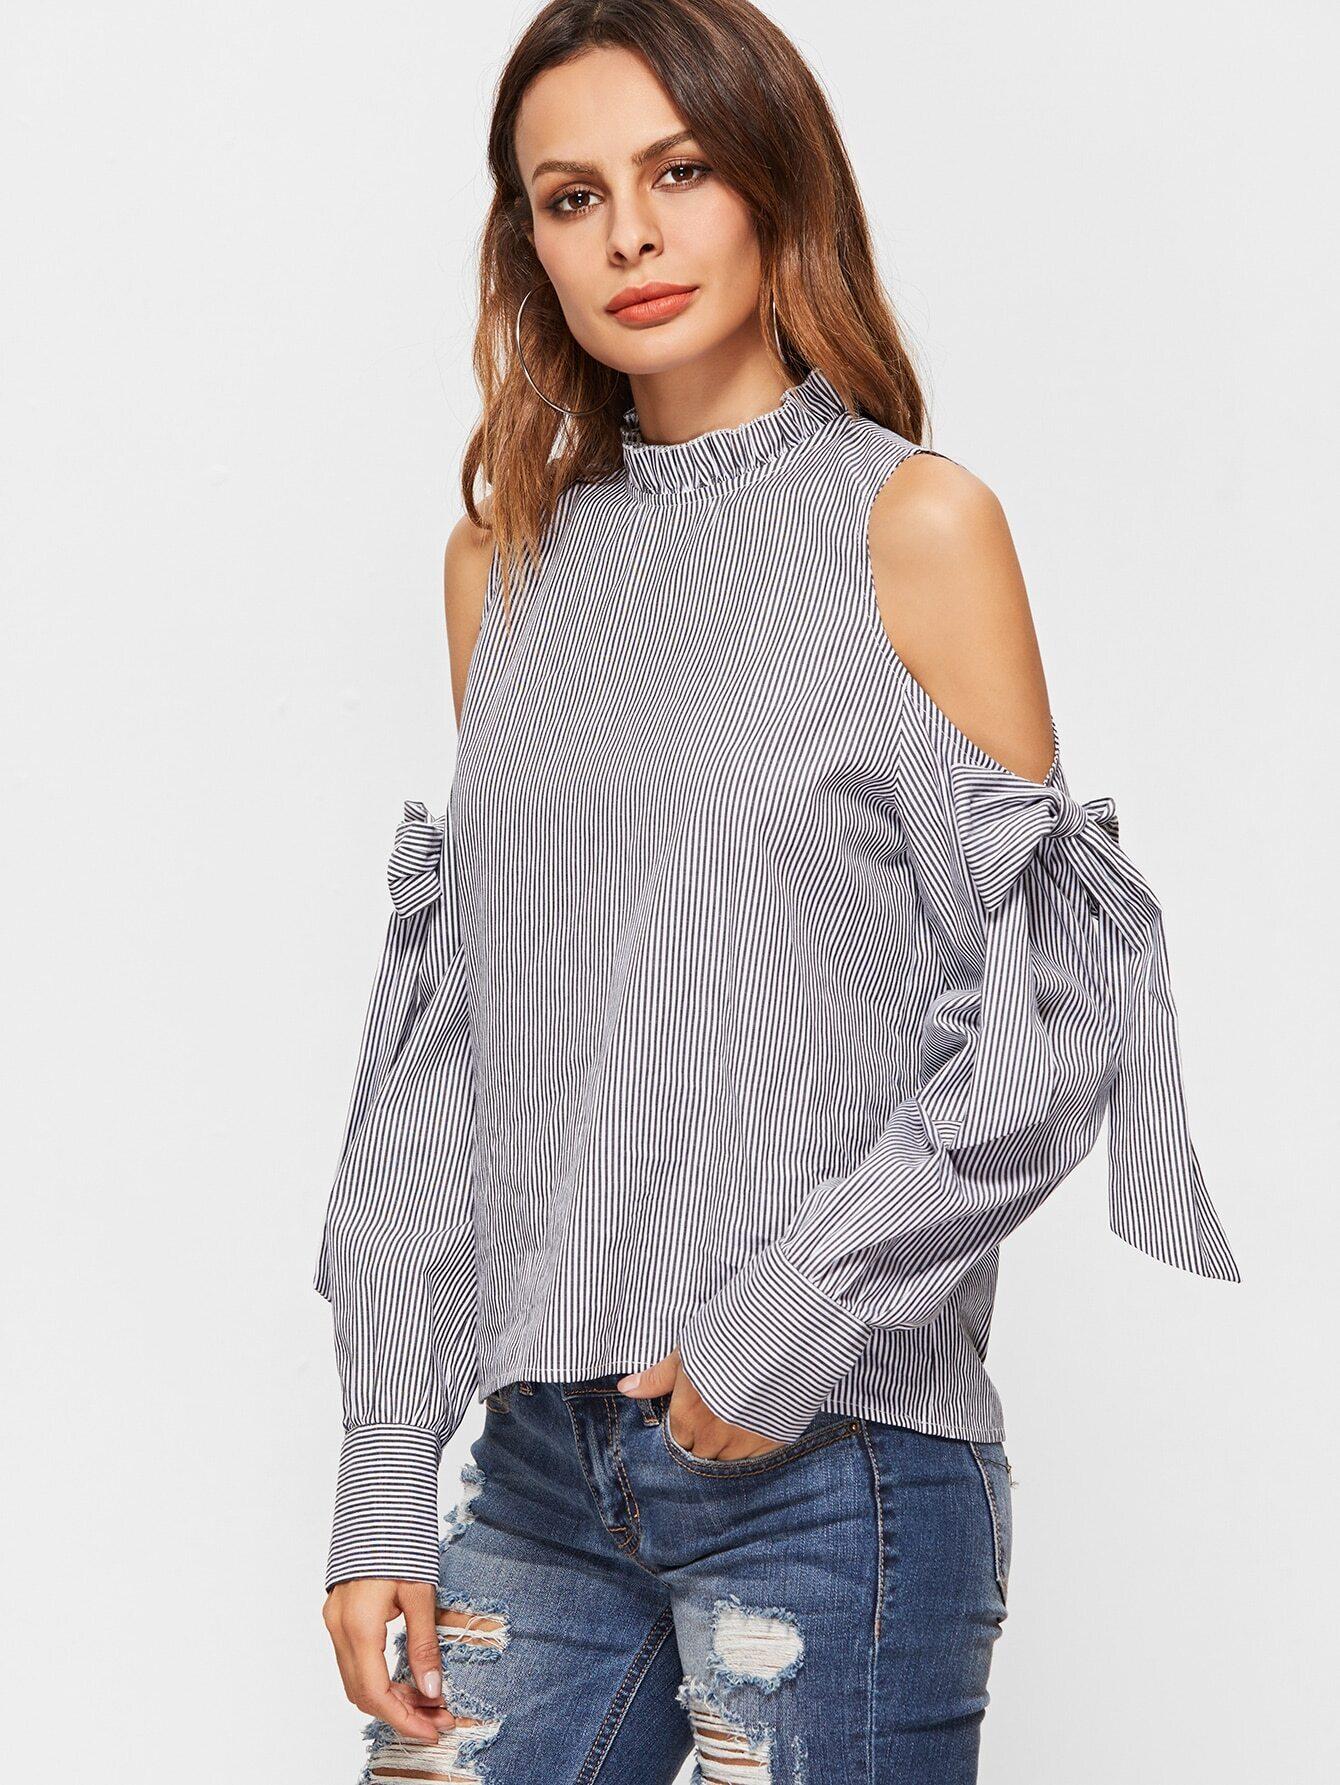 blouse161202713_1